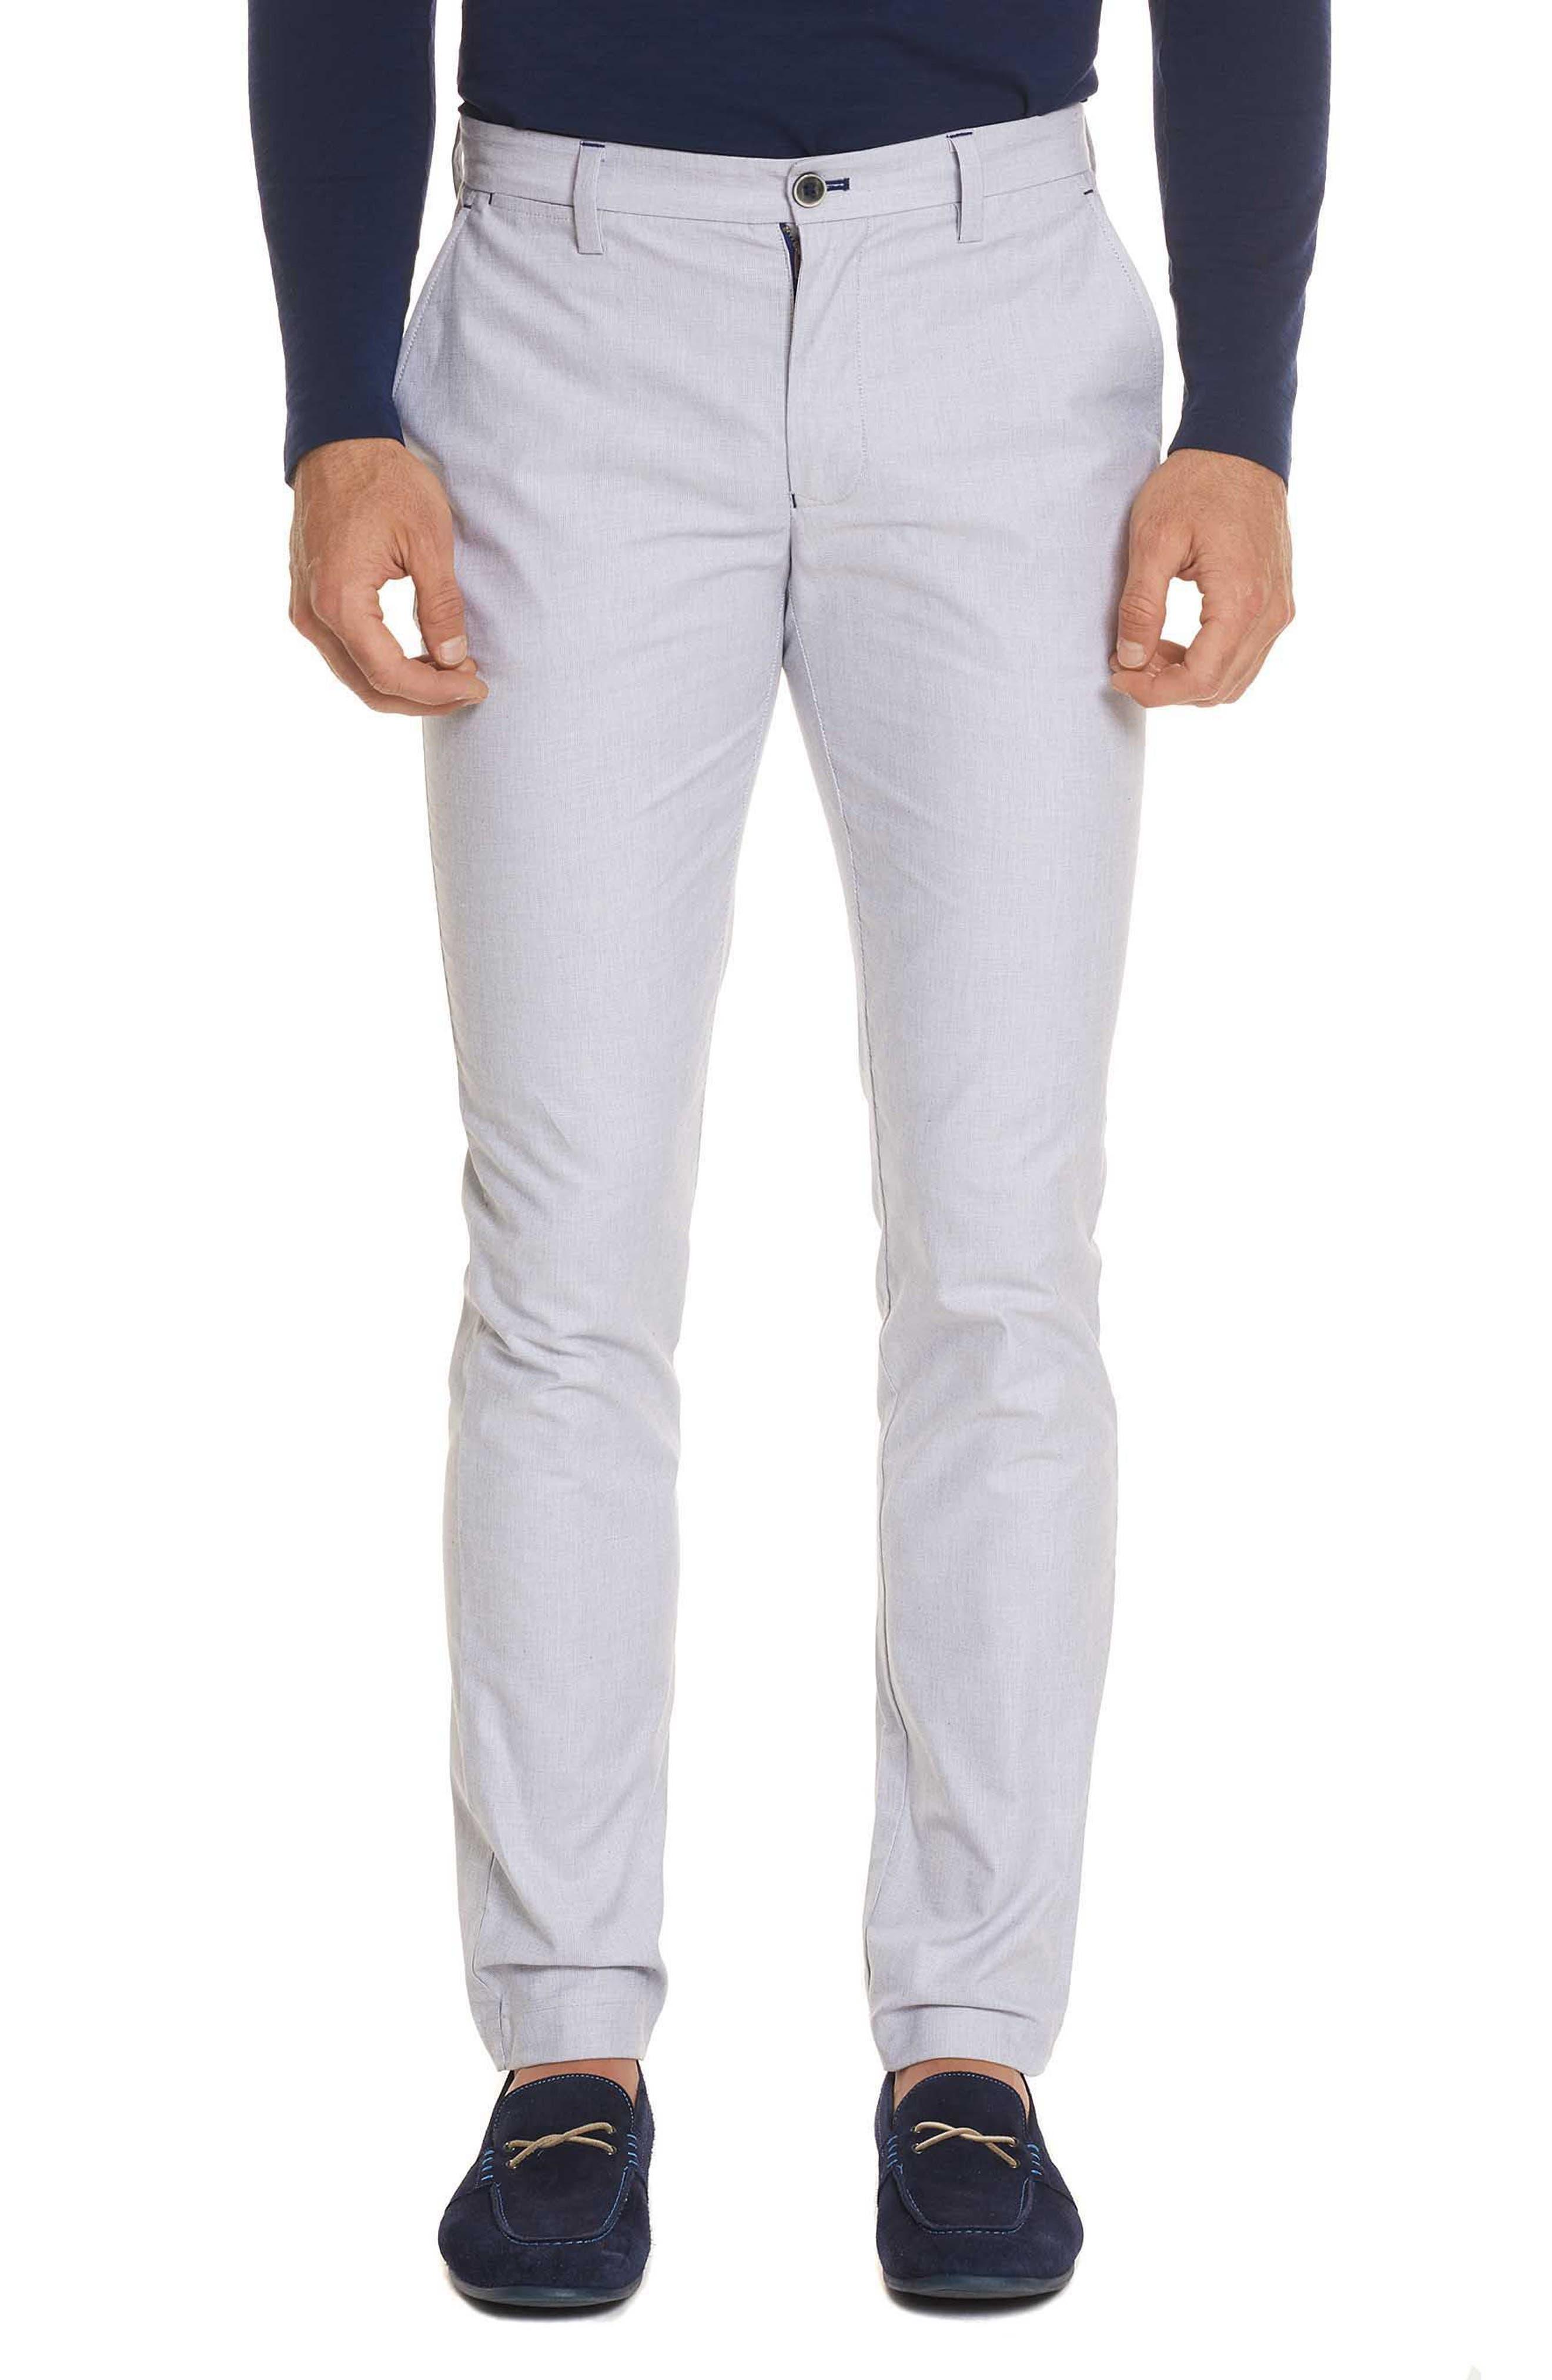 Gerardo Tailored Fit Pants,                             Main thumbnail 1, color,                             100